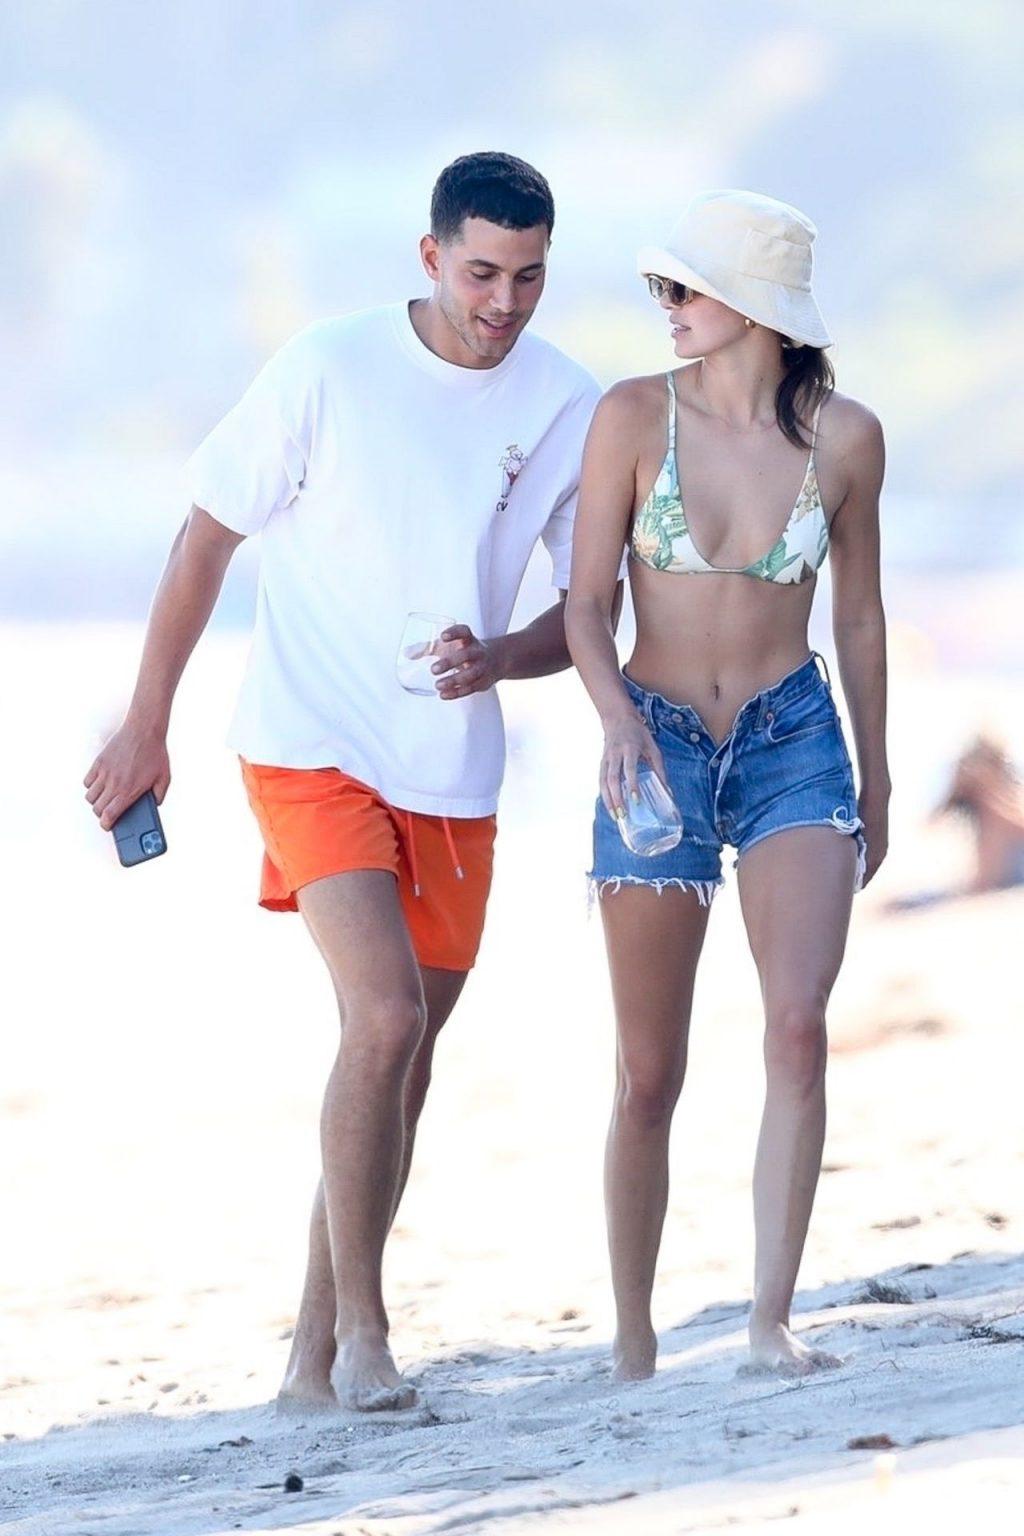 Kendall Jenner & Fai Khadra Go For a Walk While Enjoying a Beach Day in Malibu (191 Photos)